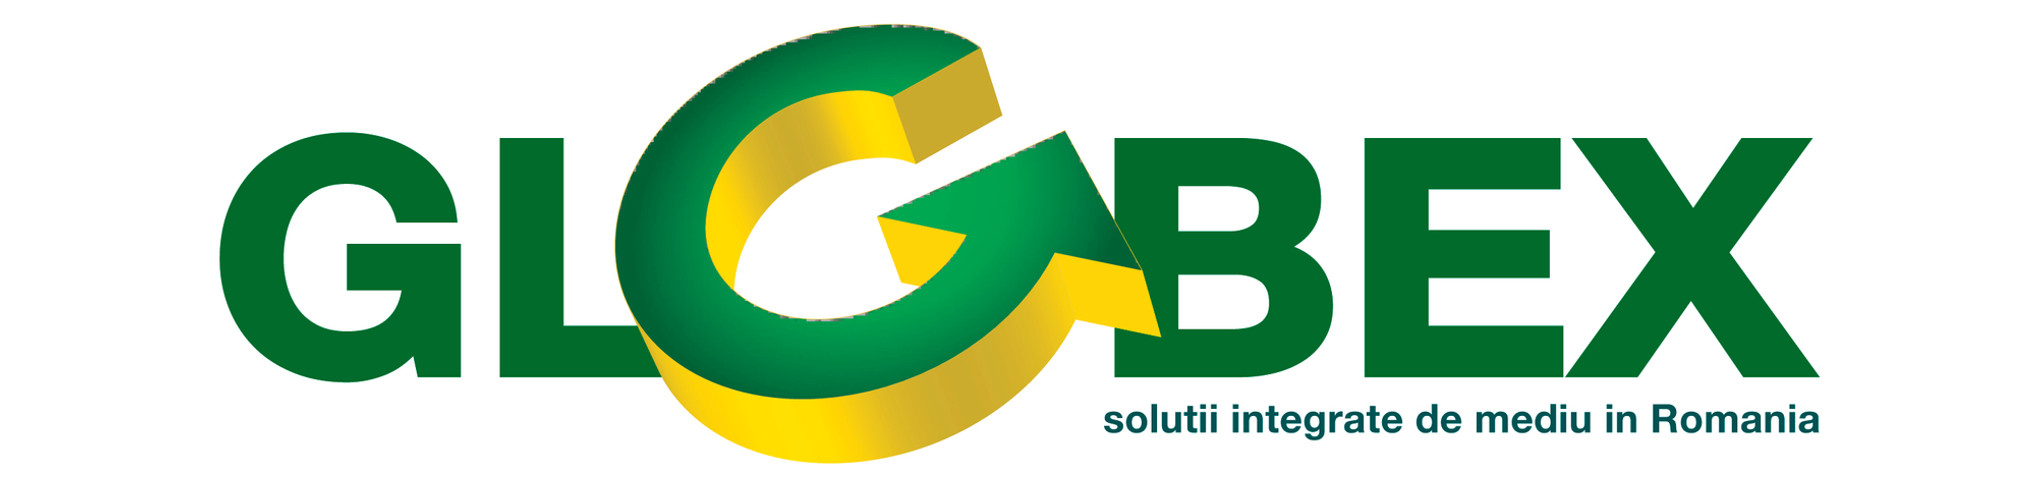 logo globex nou.jpg